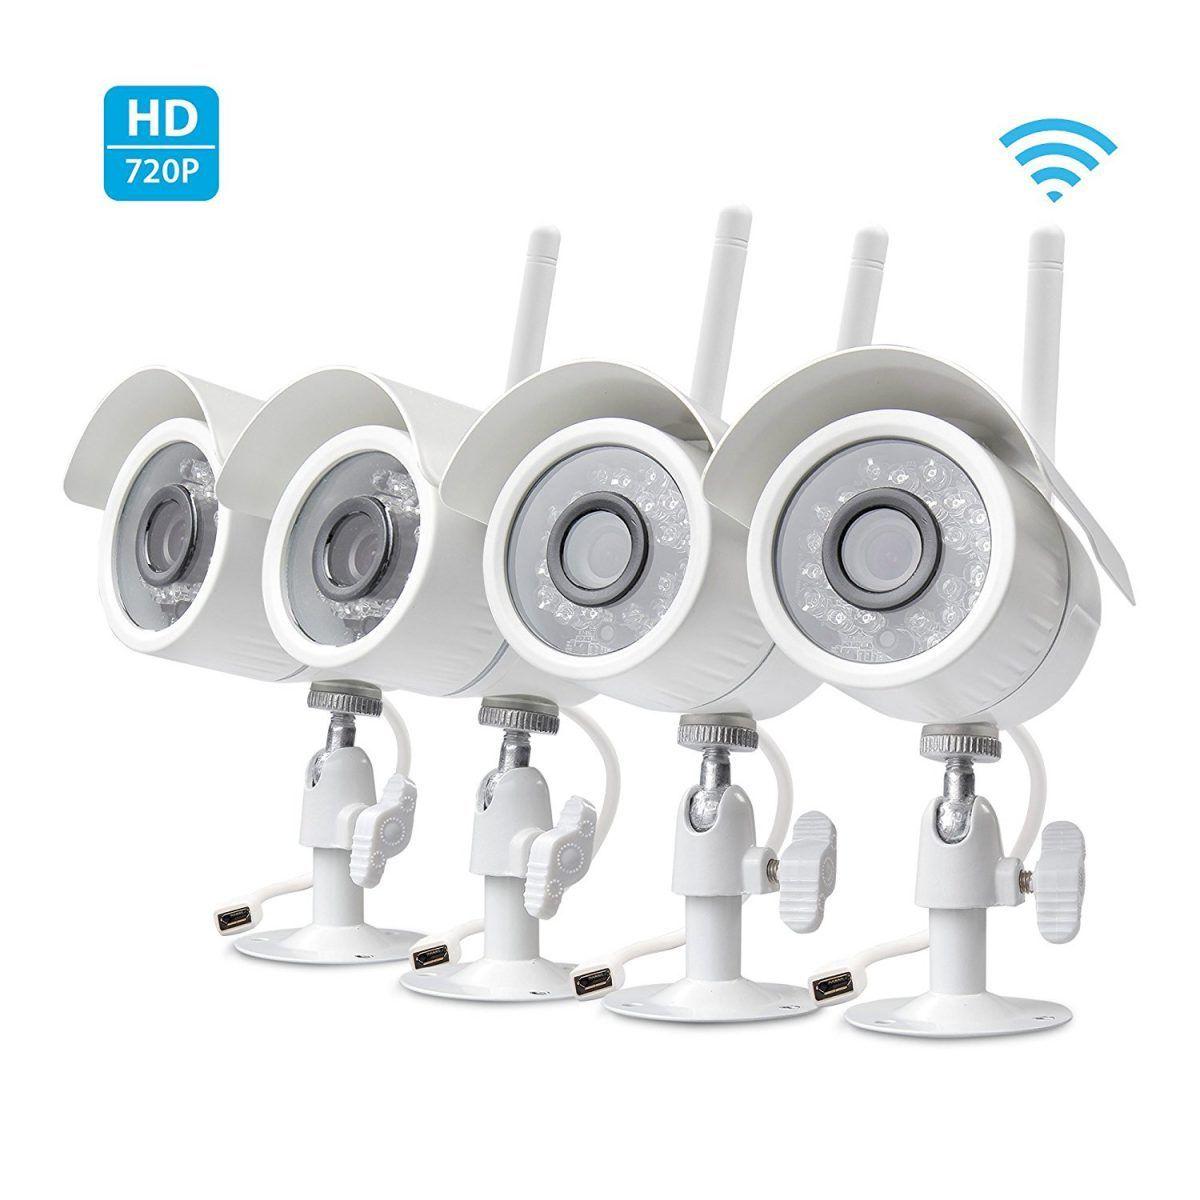 Zmodo Wireless Outdoor Security Camera Review | Security Cameras ...